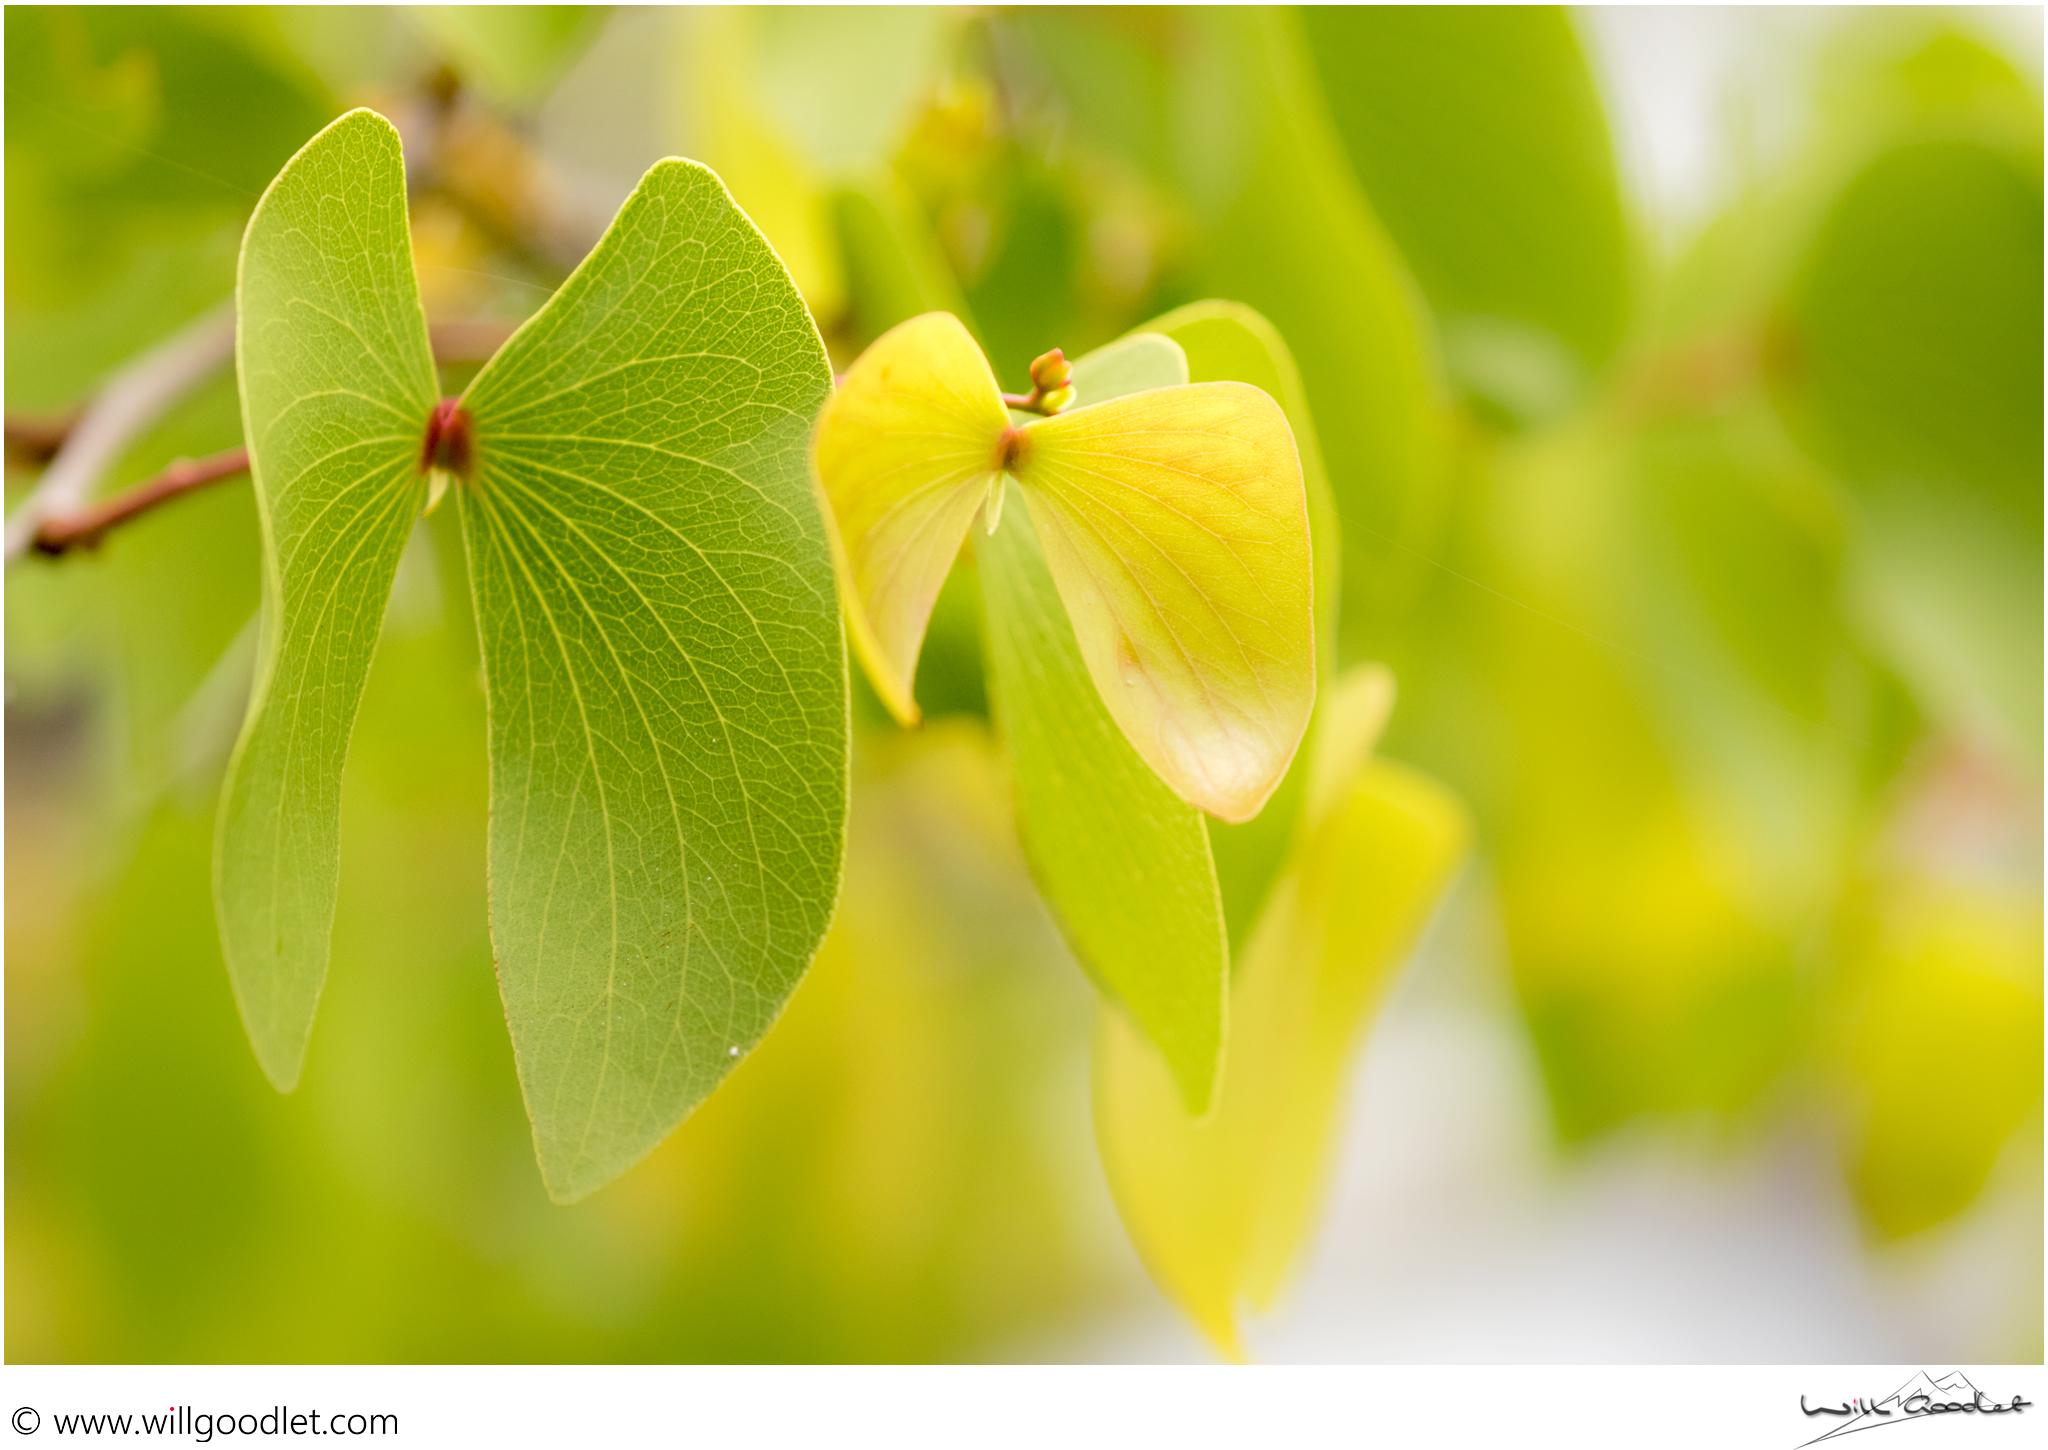 Tsendze Rustic Camp, green mopane leaves in the springtime